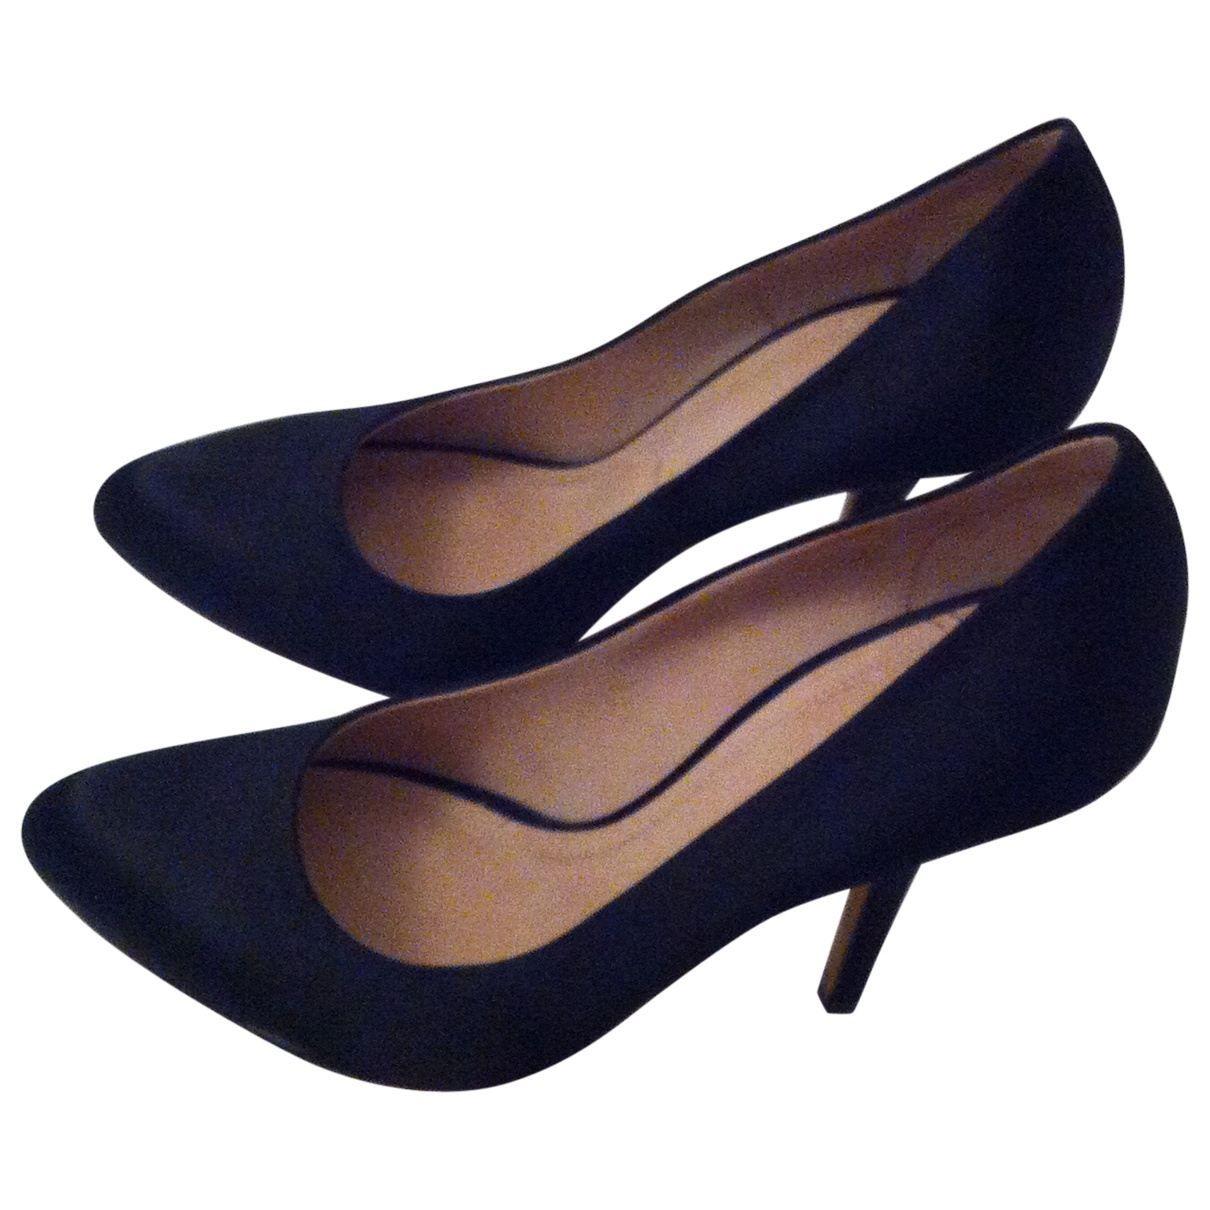 CÉLINE Cloth heels